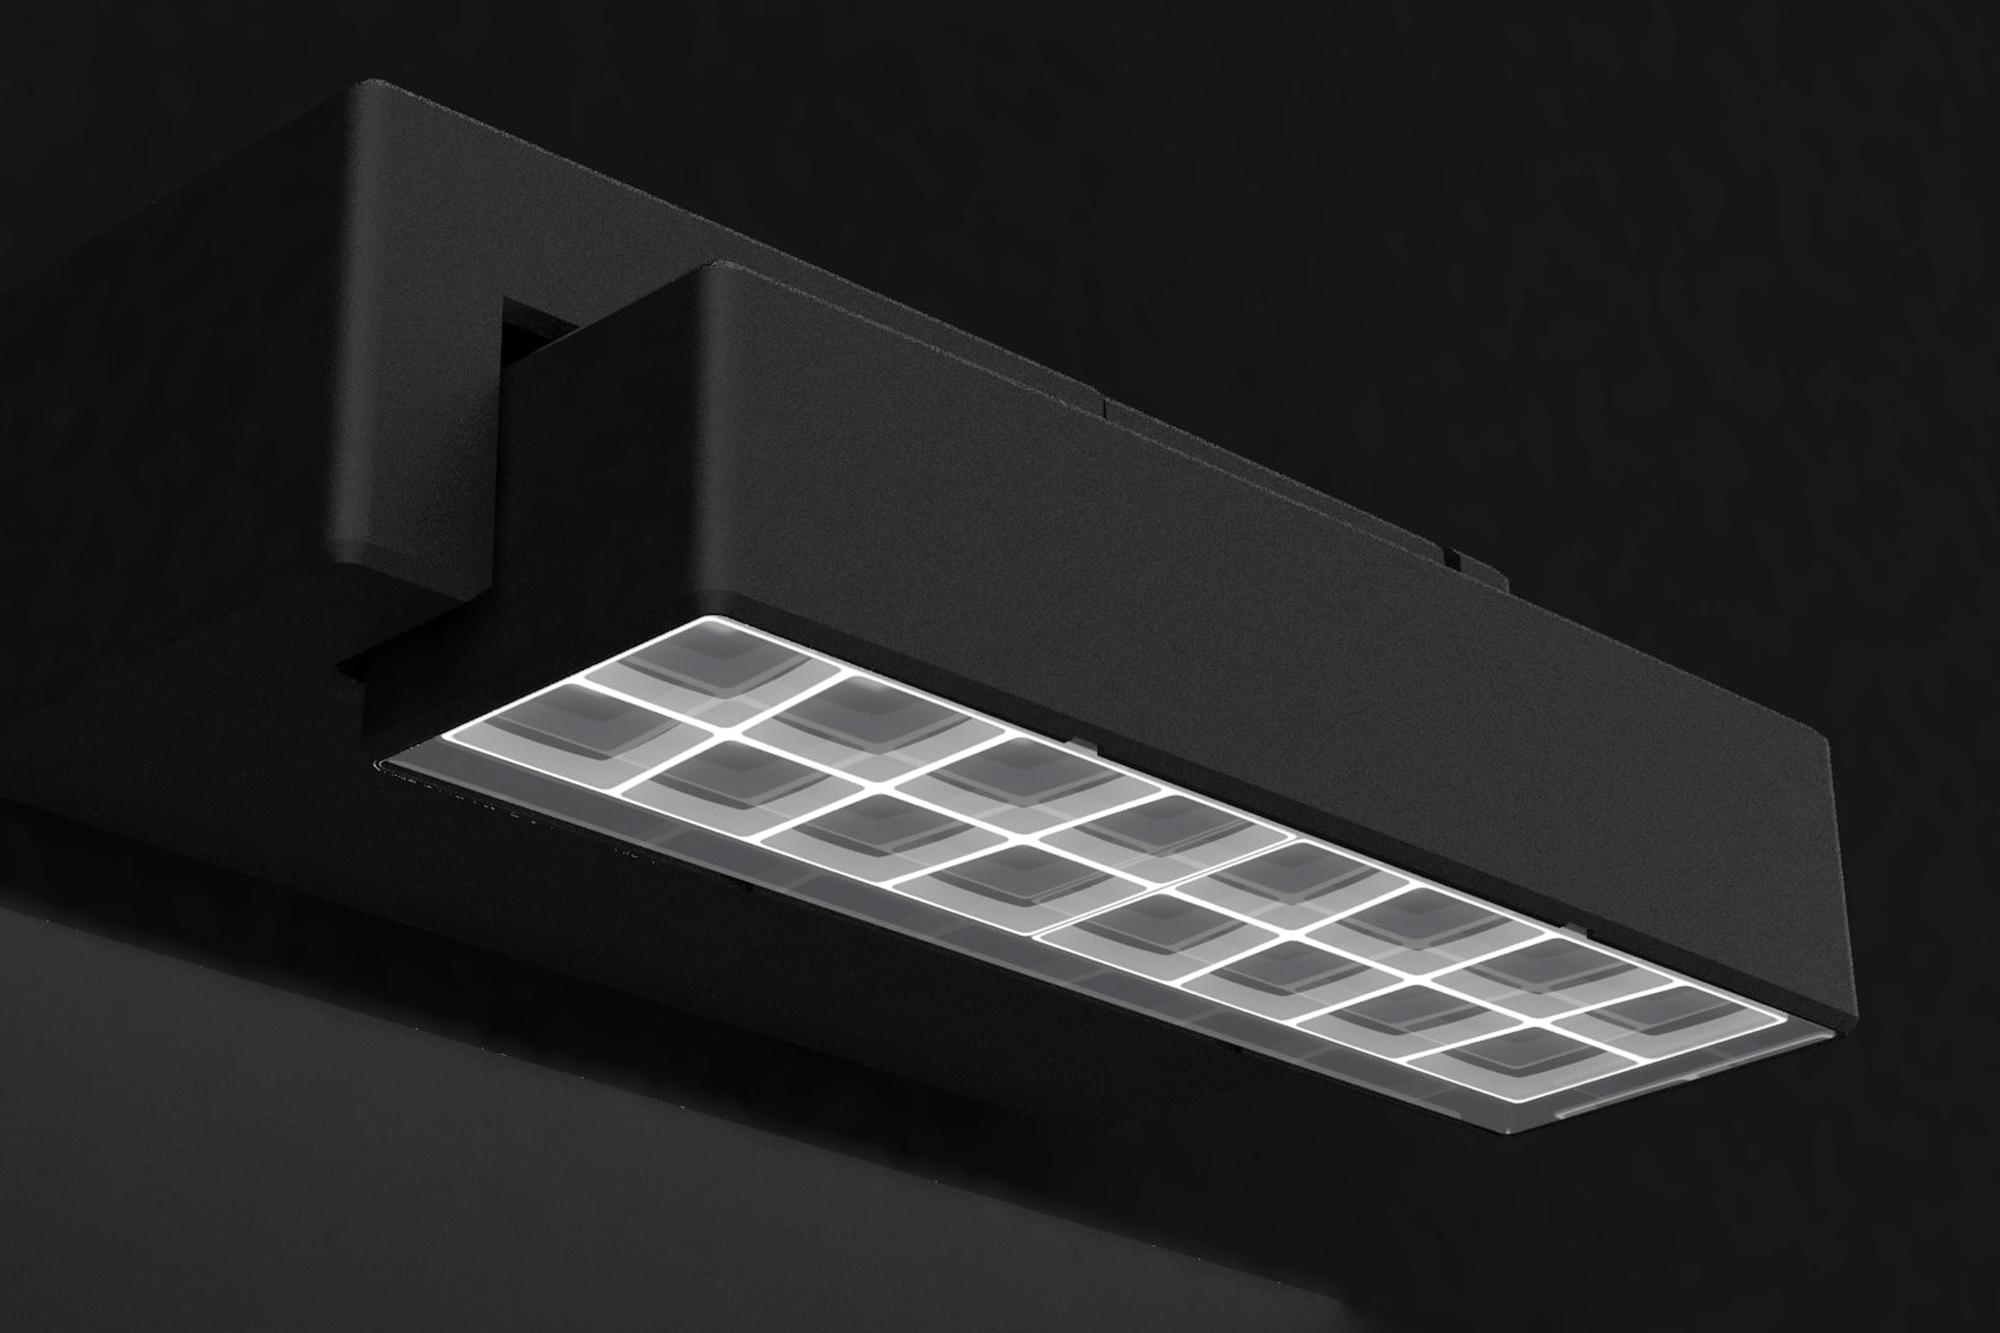 Led Display Lighting Fixtures